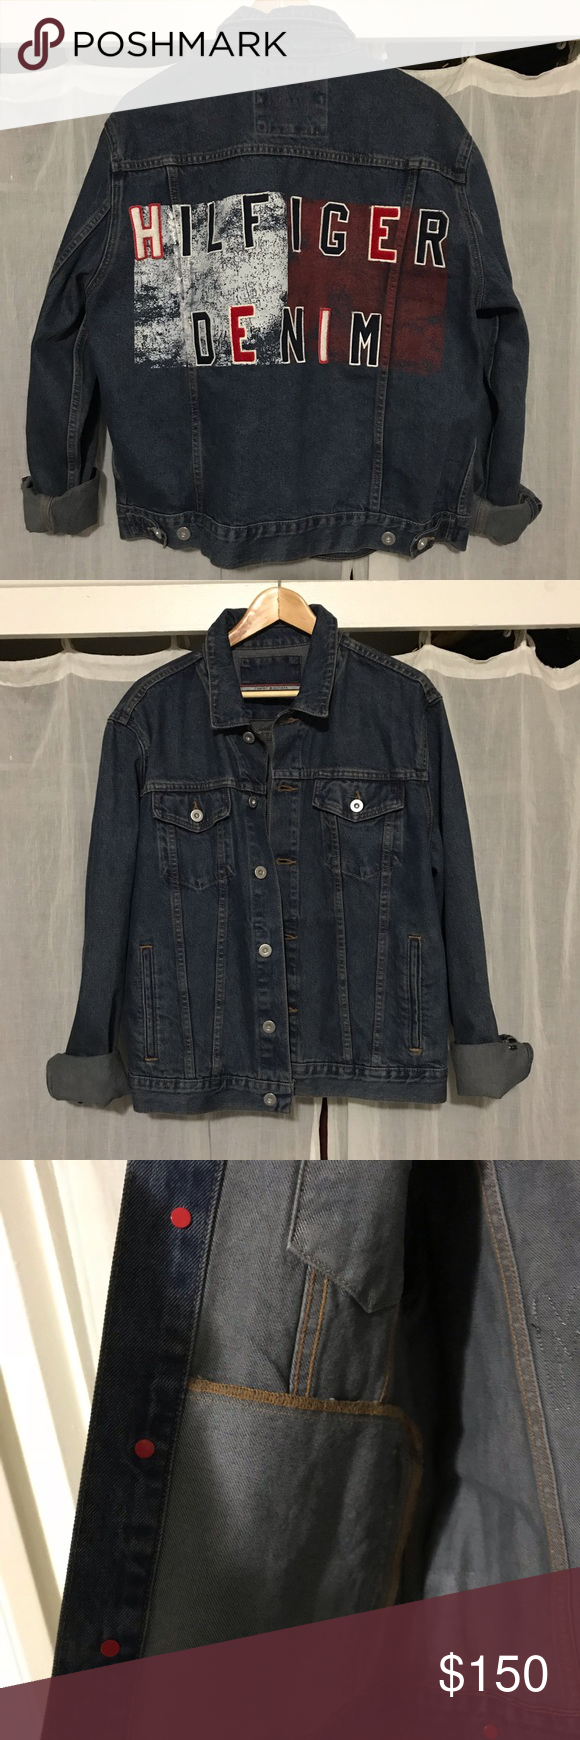 Vintage Tommy Hilfiger Logo Jean Jacket Urban Outfitters Jacket Jackets Tommy Hilfiger Jackets [ 1740 x 580 Pixel ]